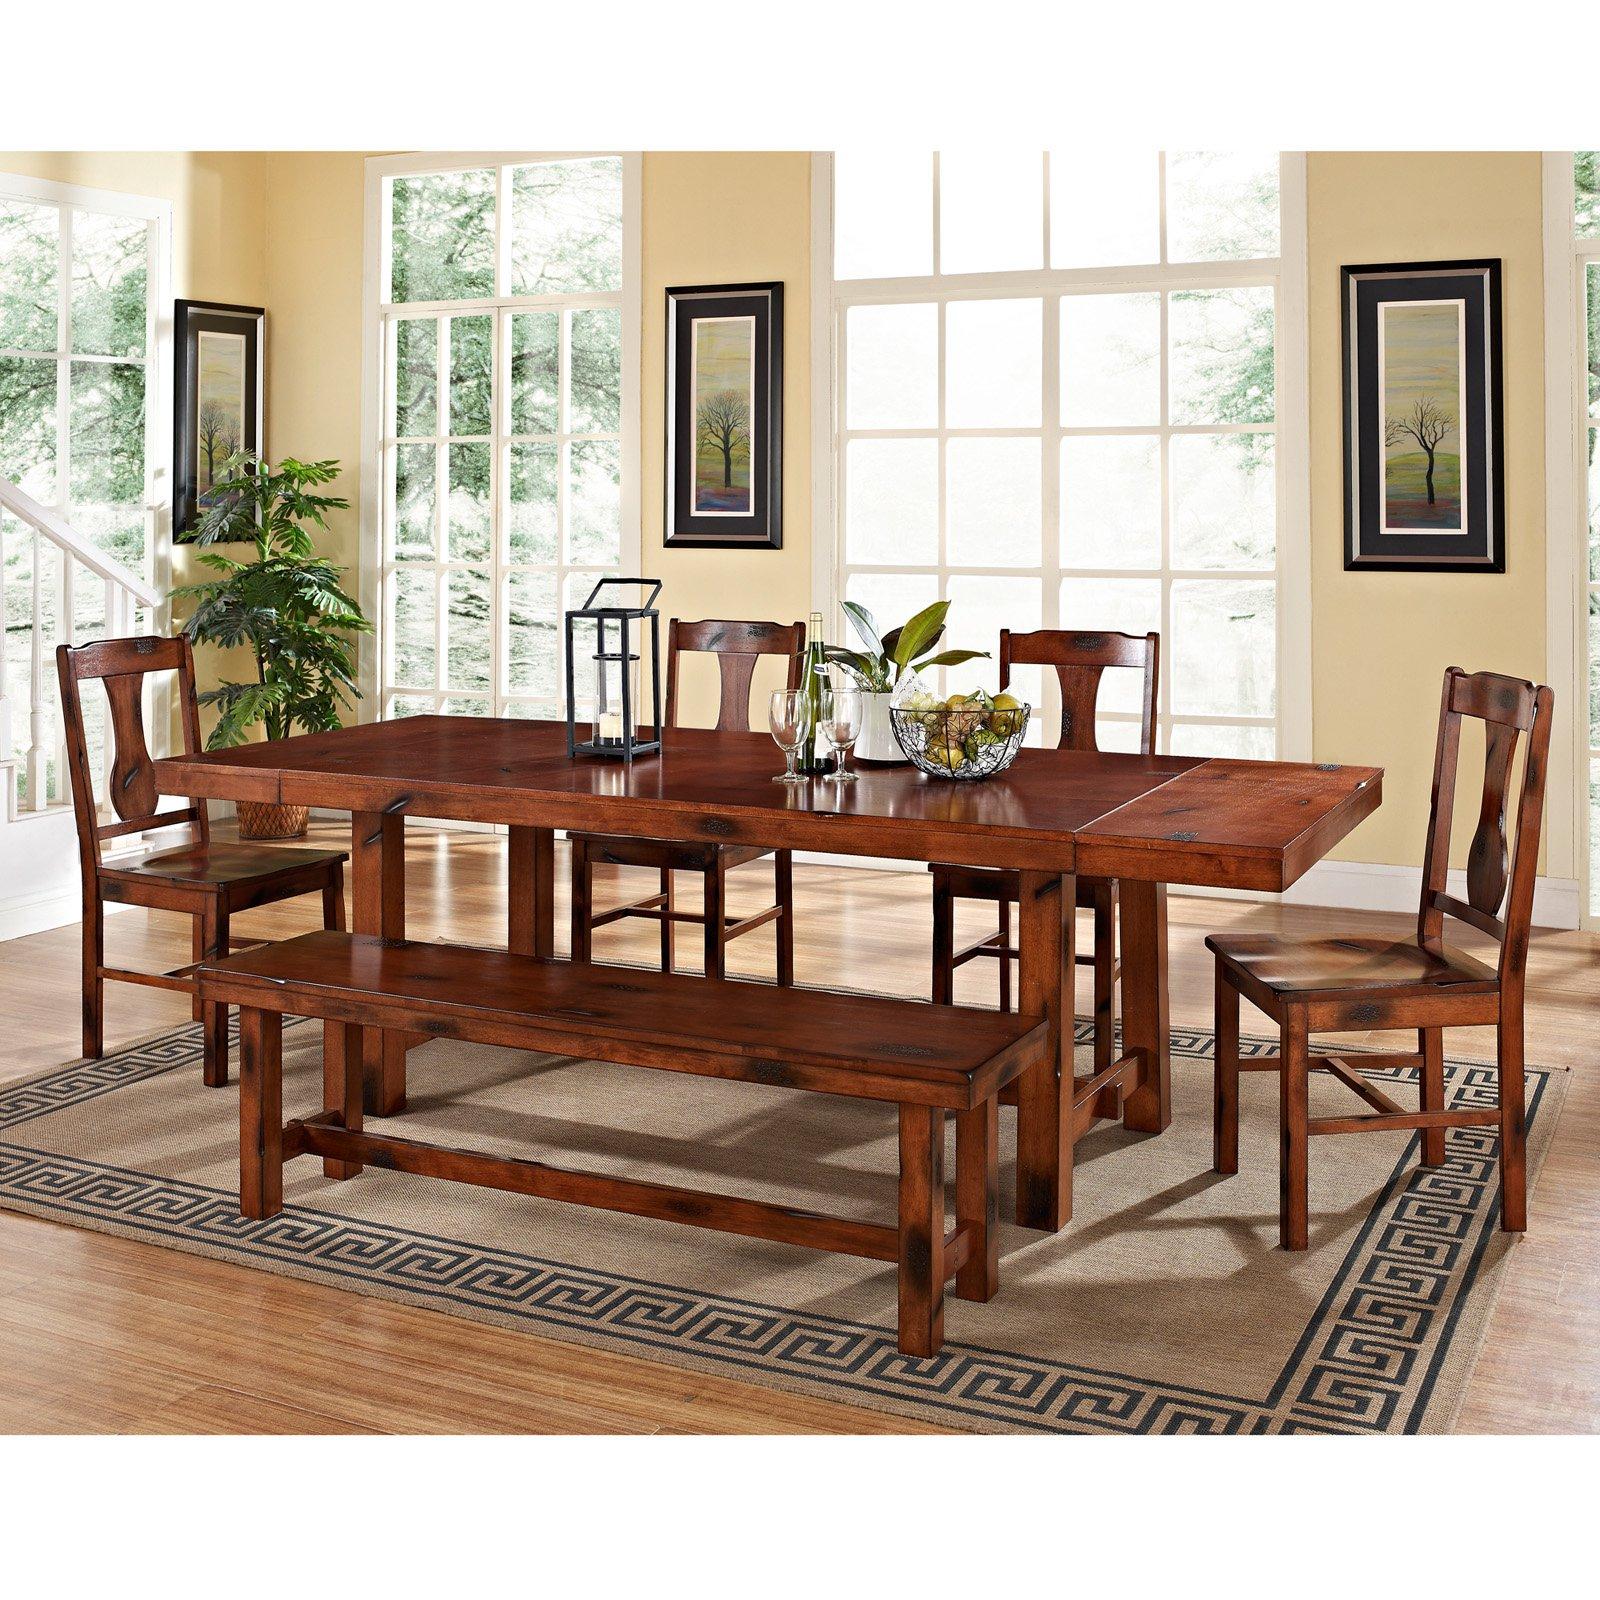 6-Piece Wood Dining Set, Dark Oak (Box 1 of 3)